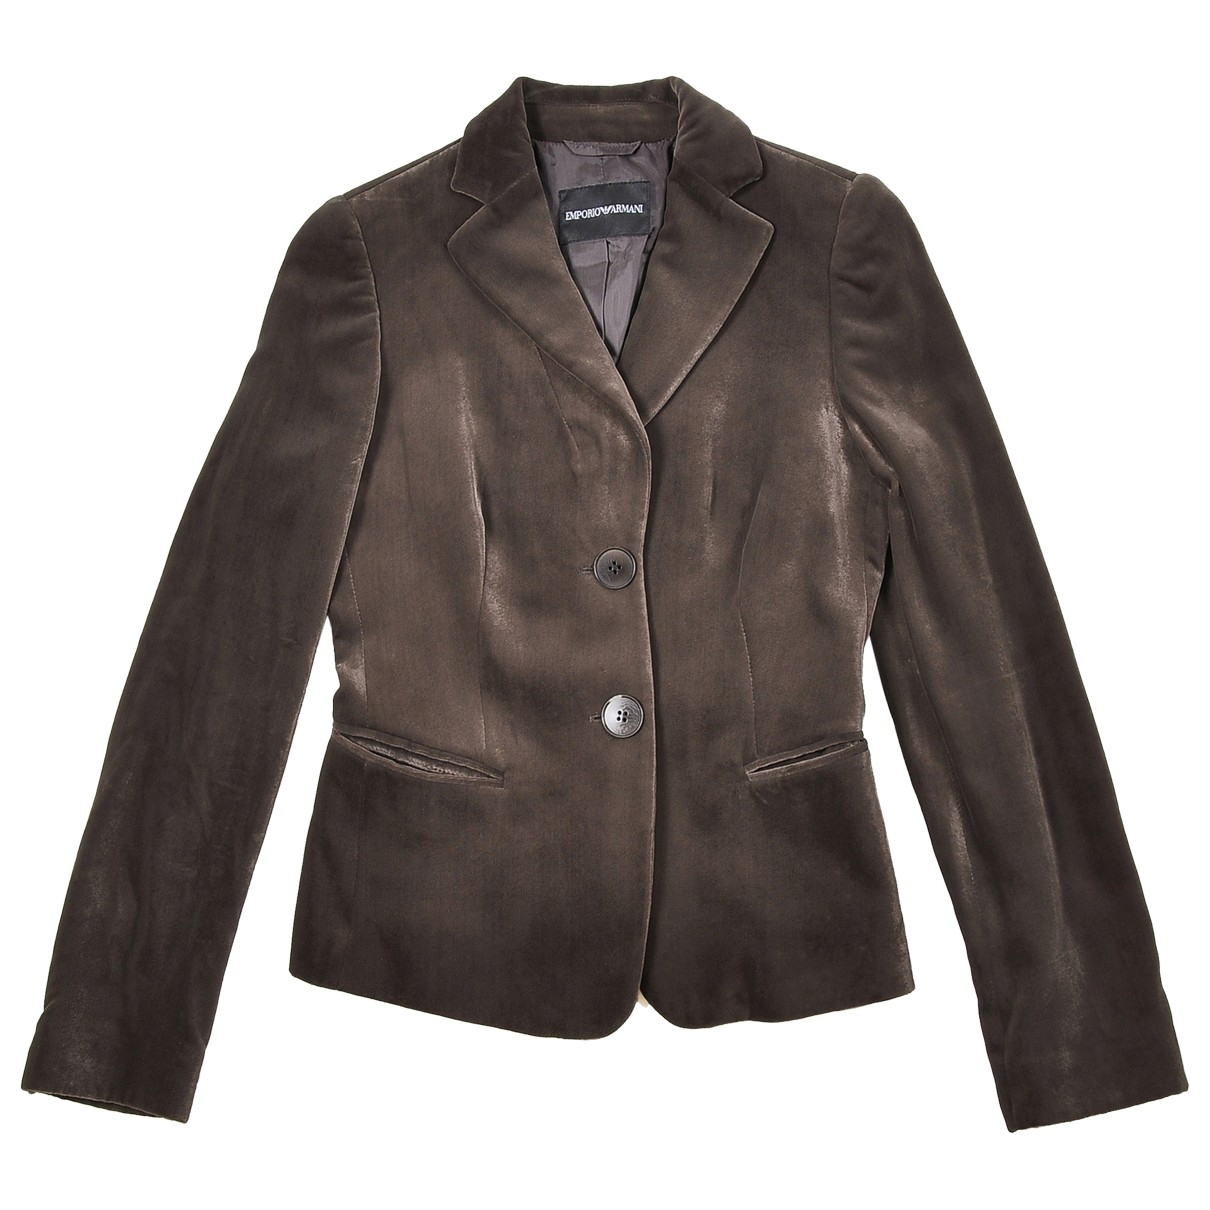 Emporio Armani \N Brown jacket for Women 40 IT